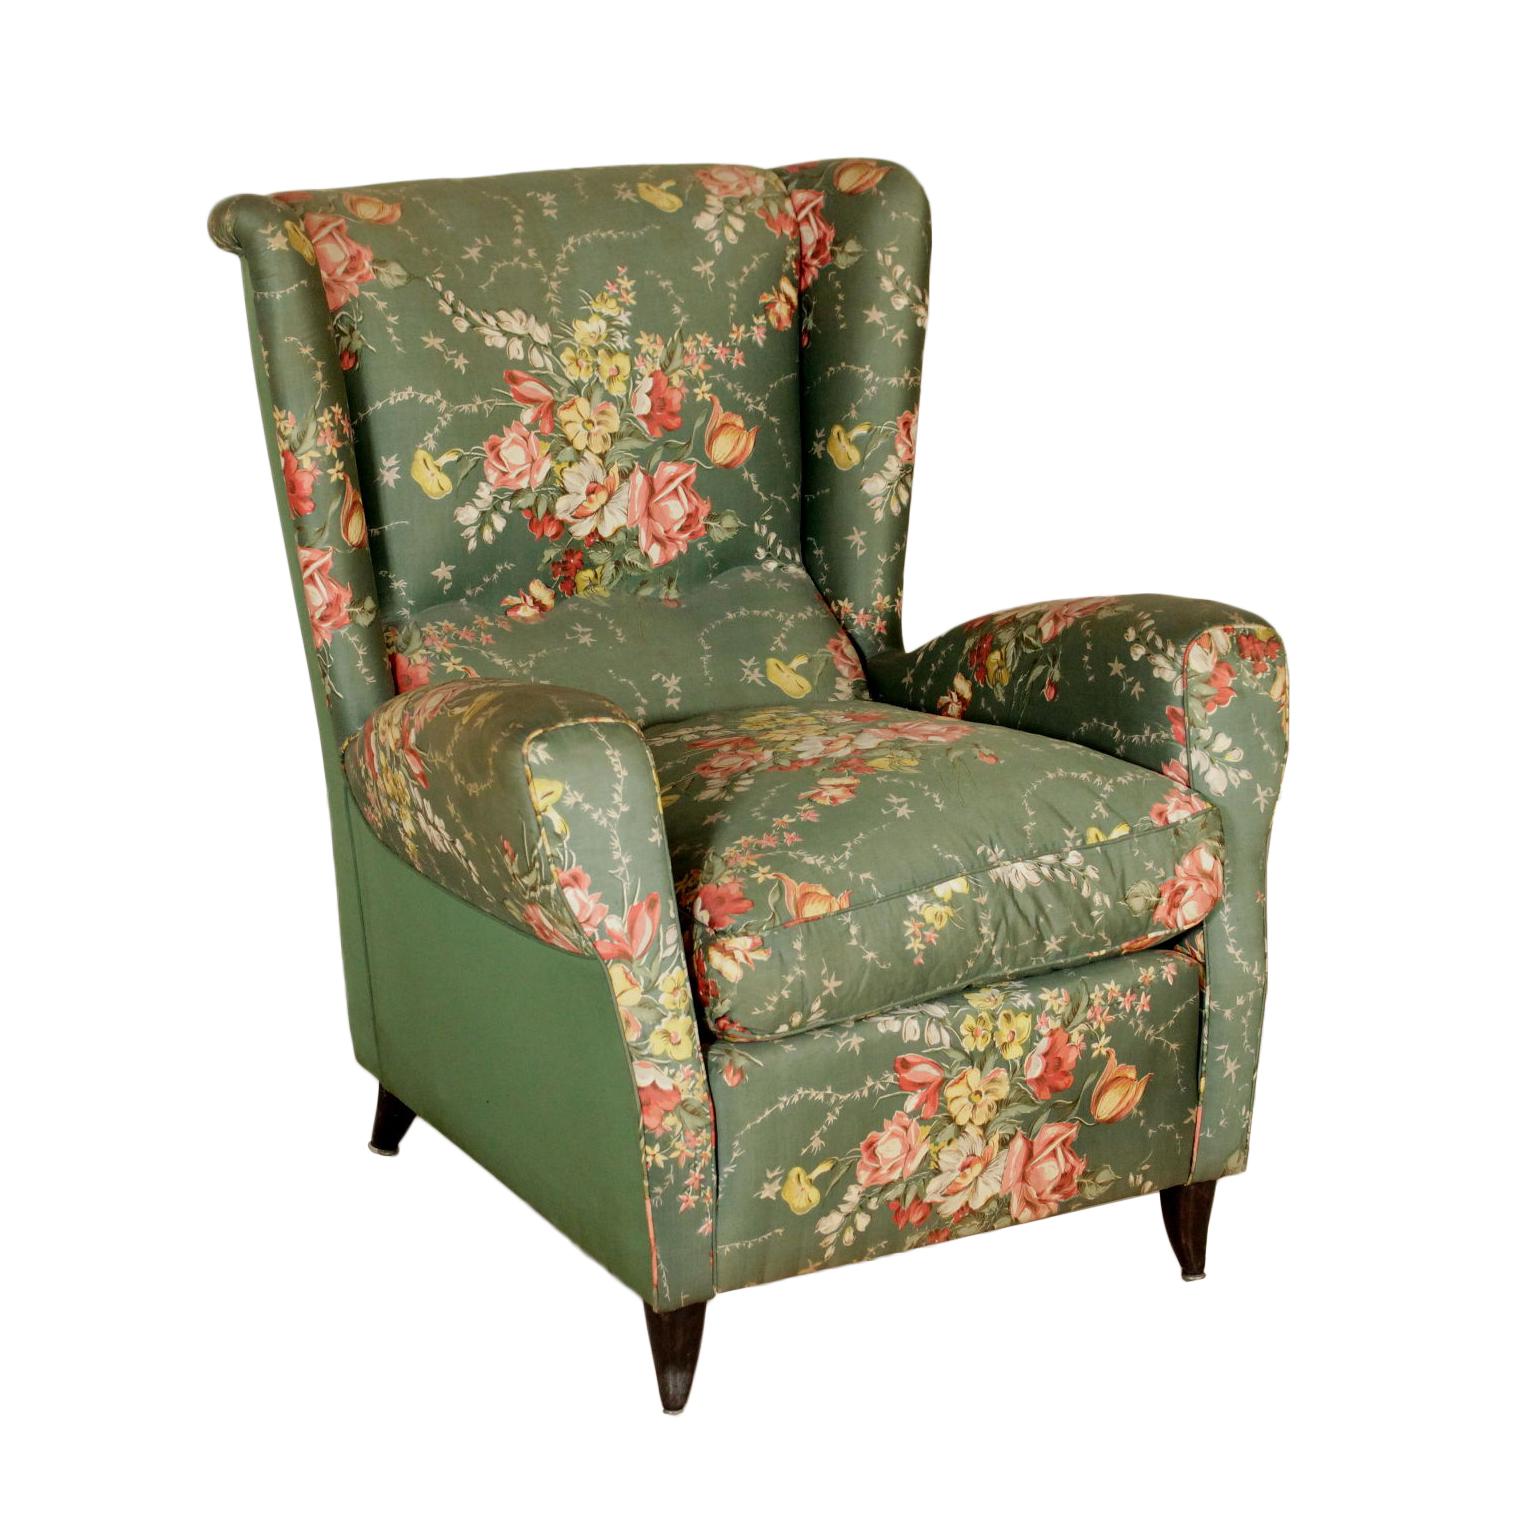 fauteuil bergere - Fauteuil Bergere